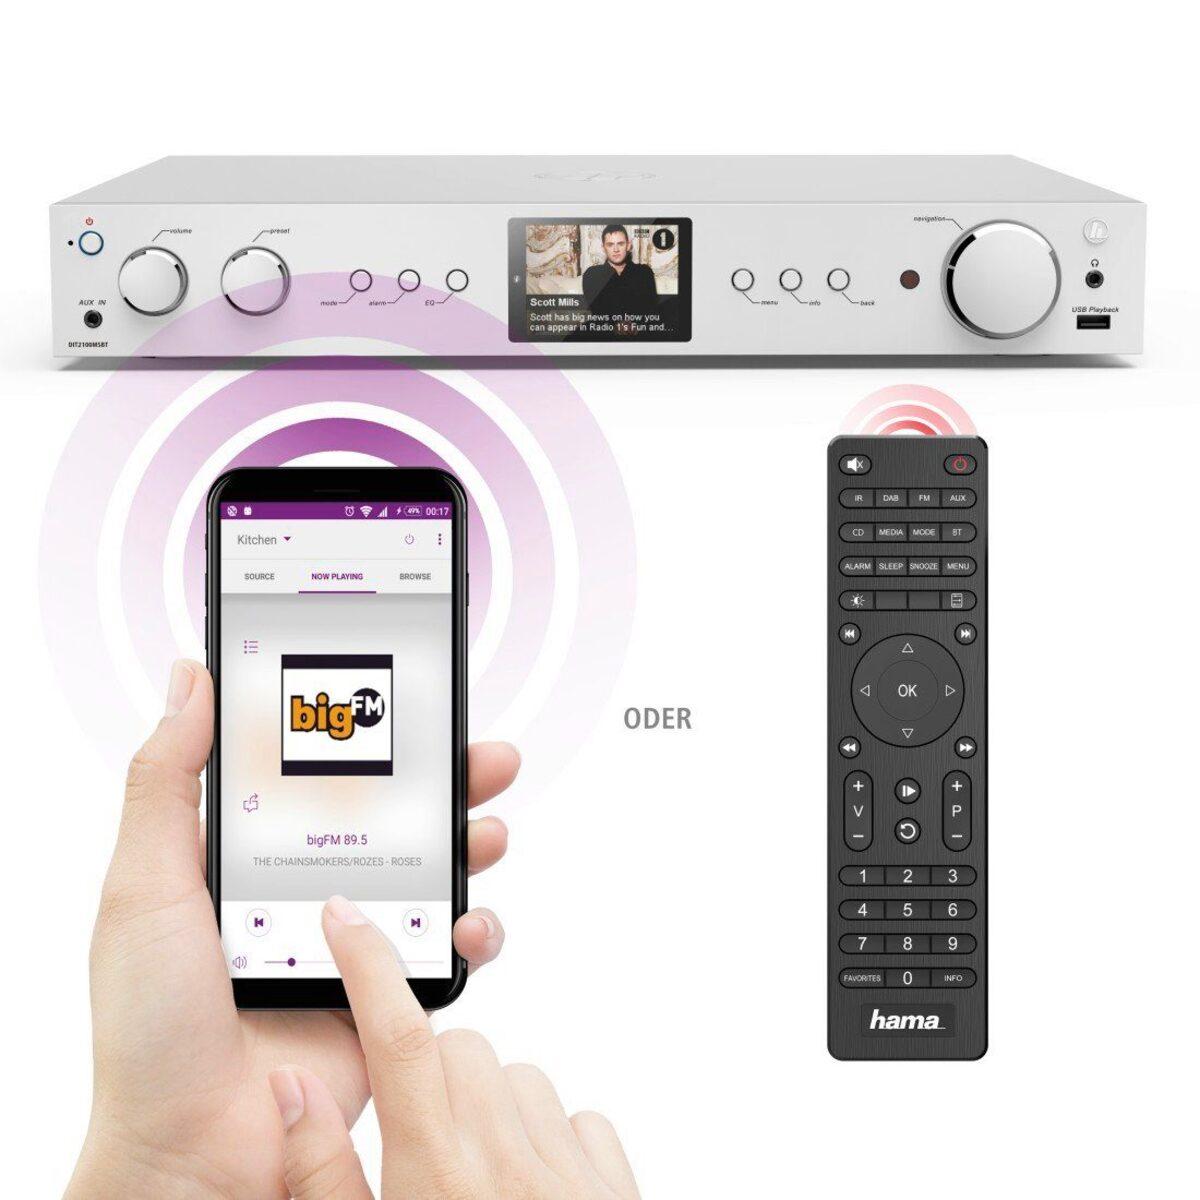 Bild 5 von Hama Digitaltuner, DAB+ Digitalradio/Internetradio/Bluetooth/USB »Aux/DIT2100MSBT«